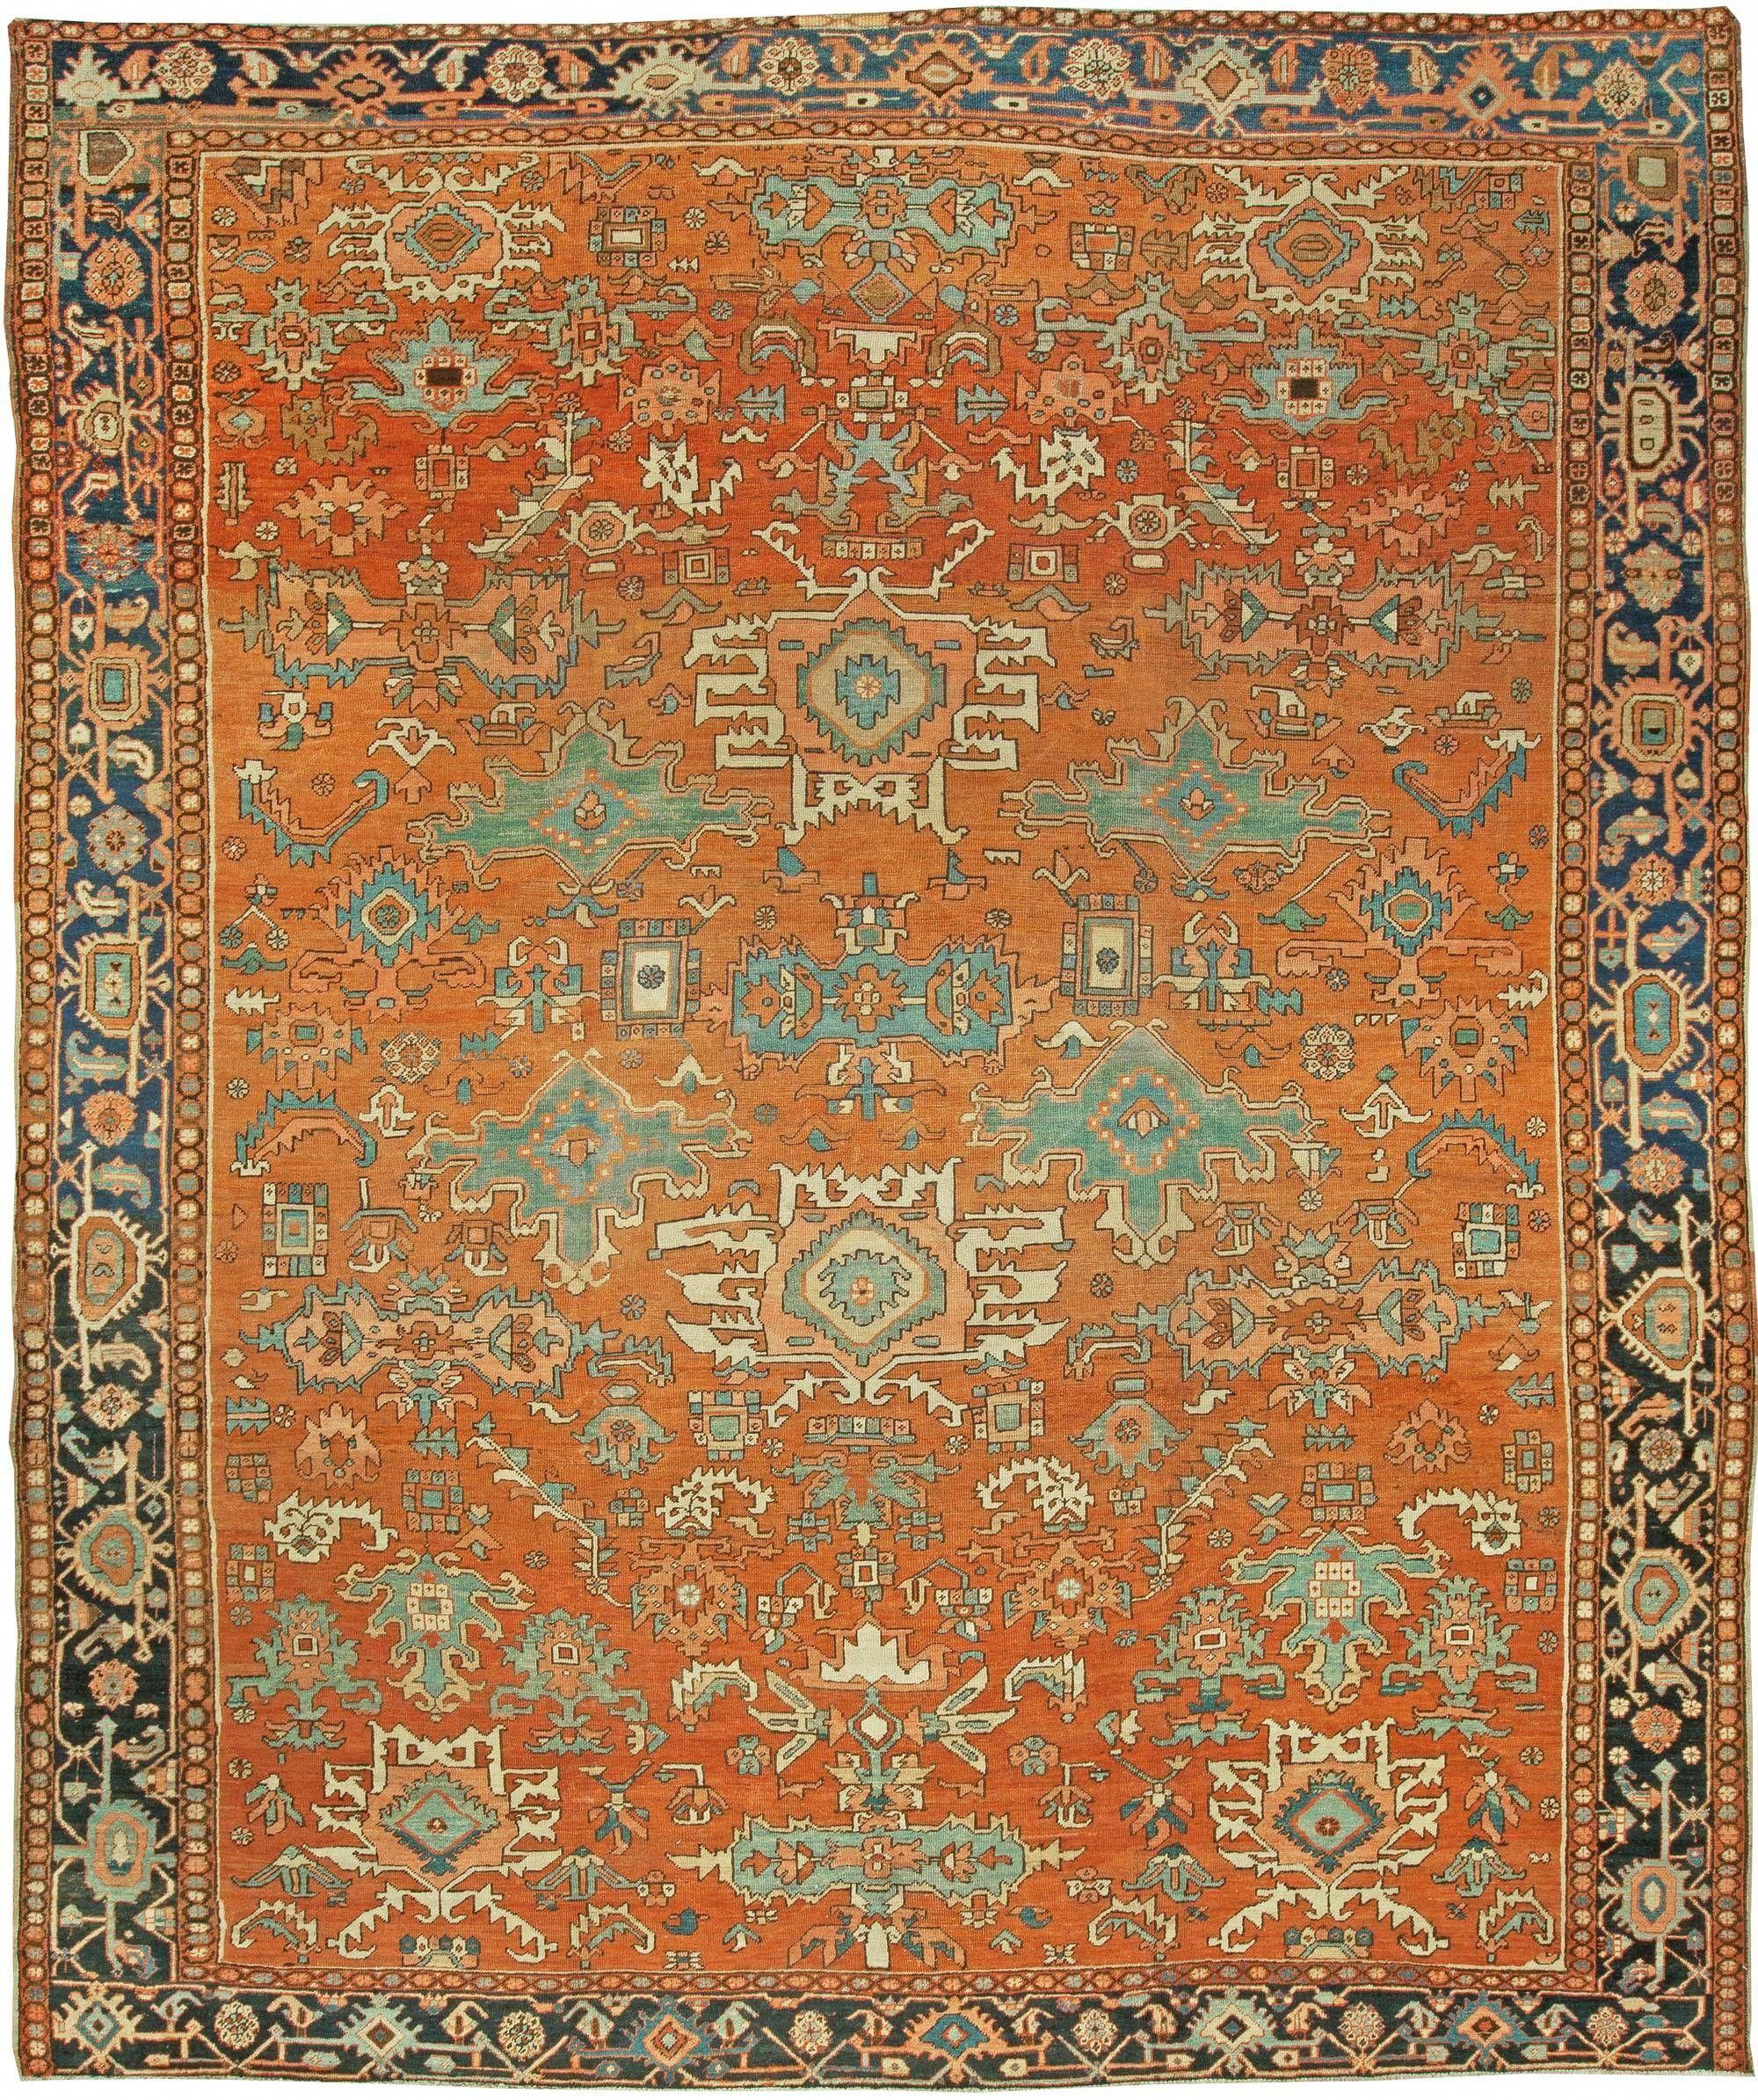 Pin On Antique Carpet Rug Kilim Persian Myo